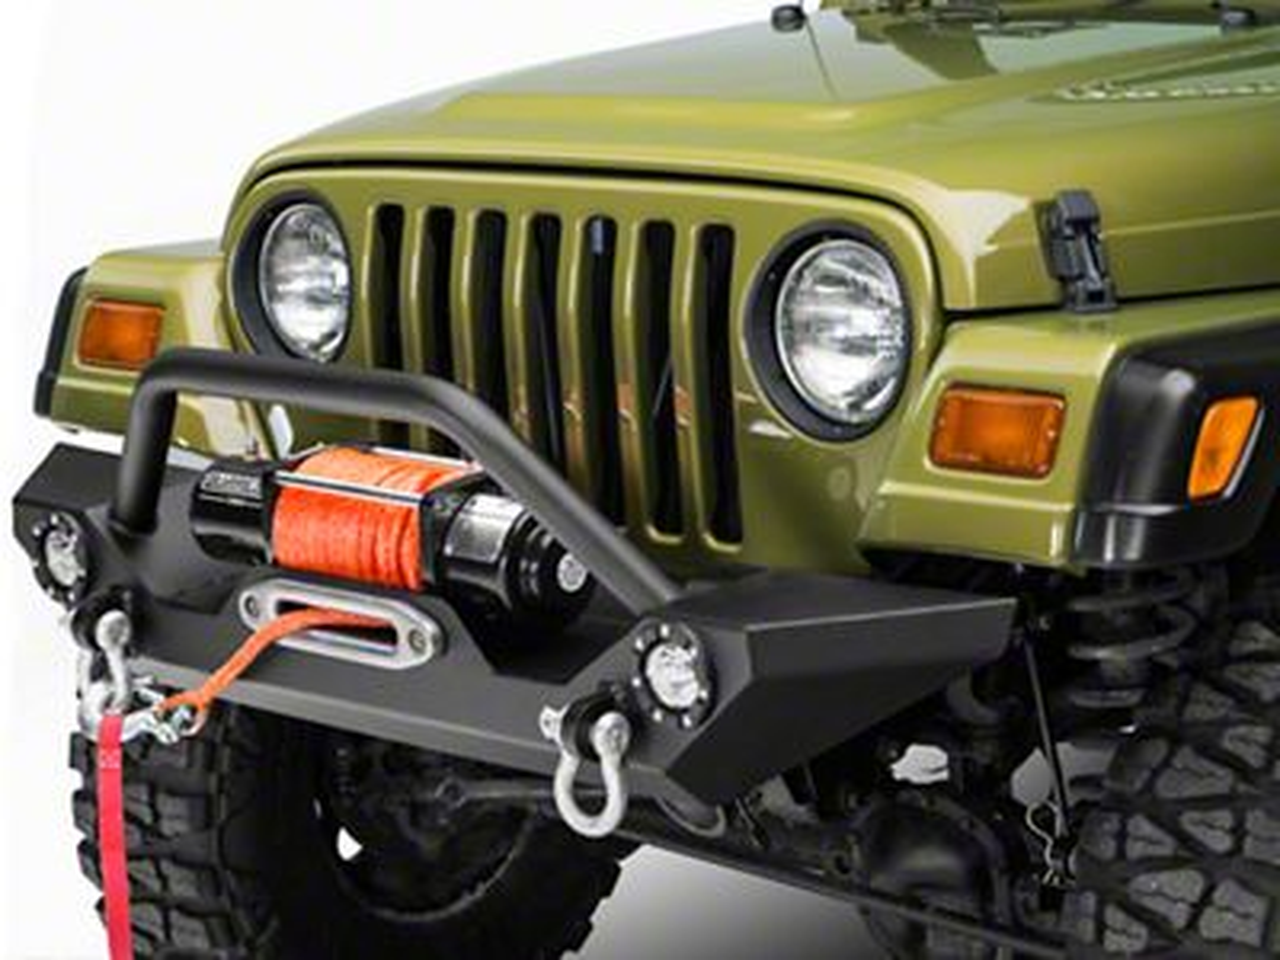 Barricade Jeep Wrangler Classic Rear Bumper W Tire